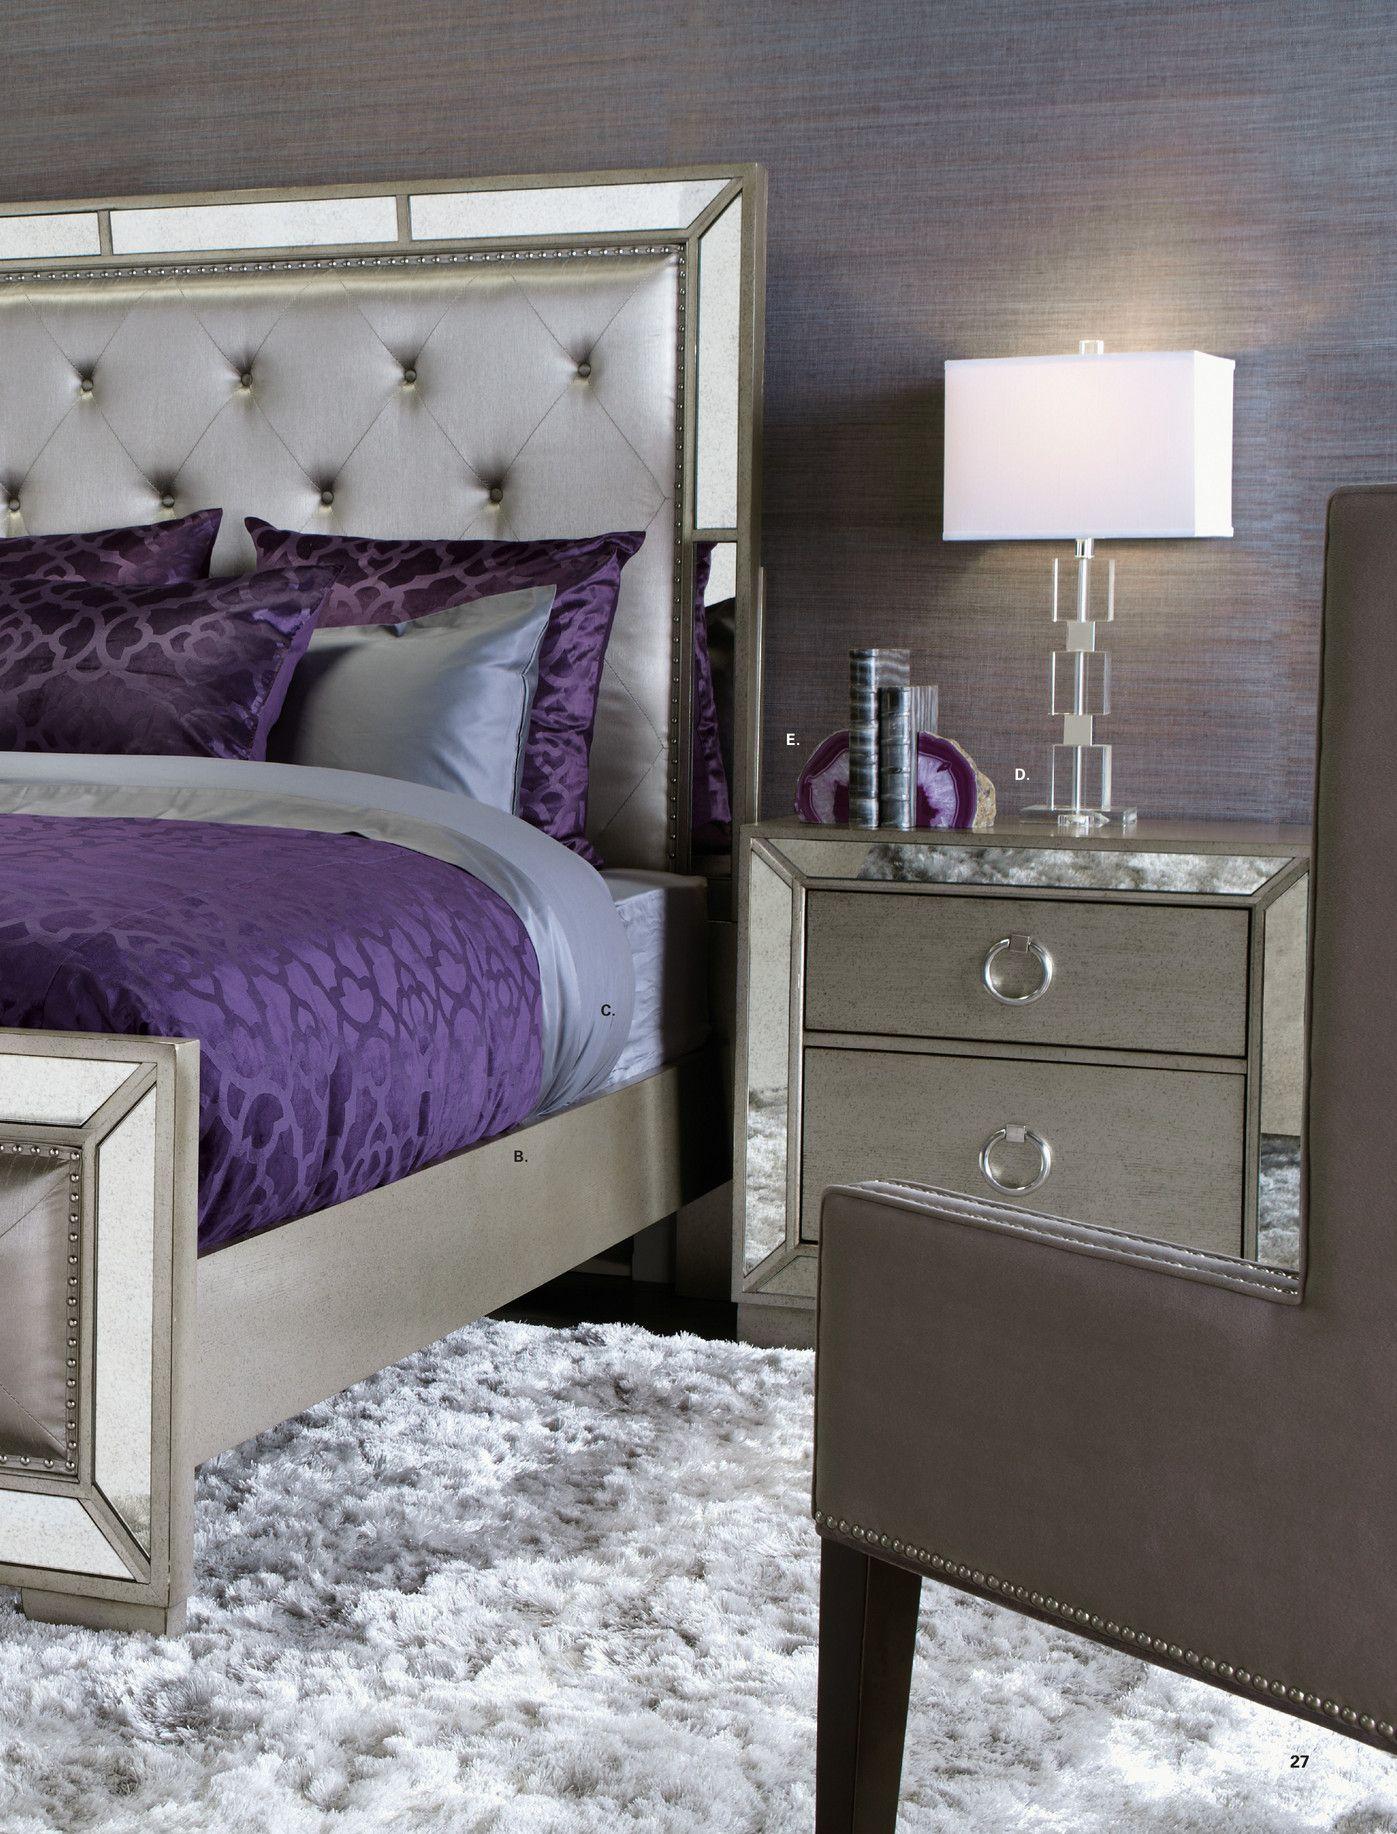 ava bedroom set from z gallerie. | all royal furniture | pinterest